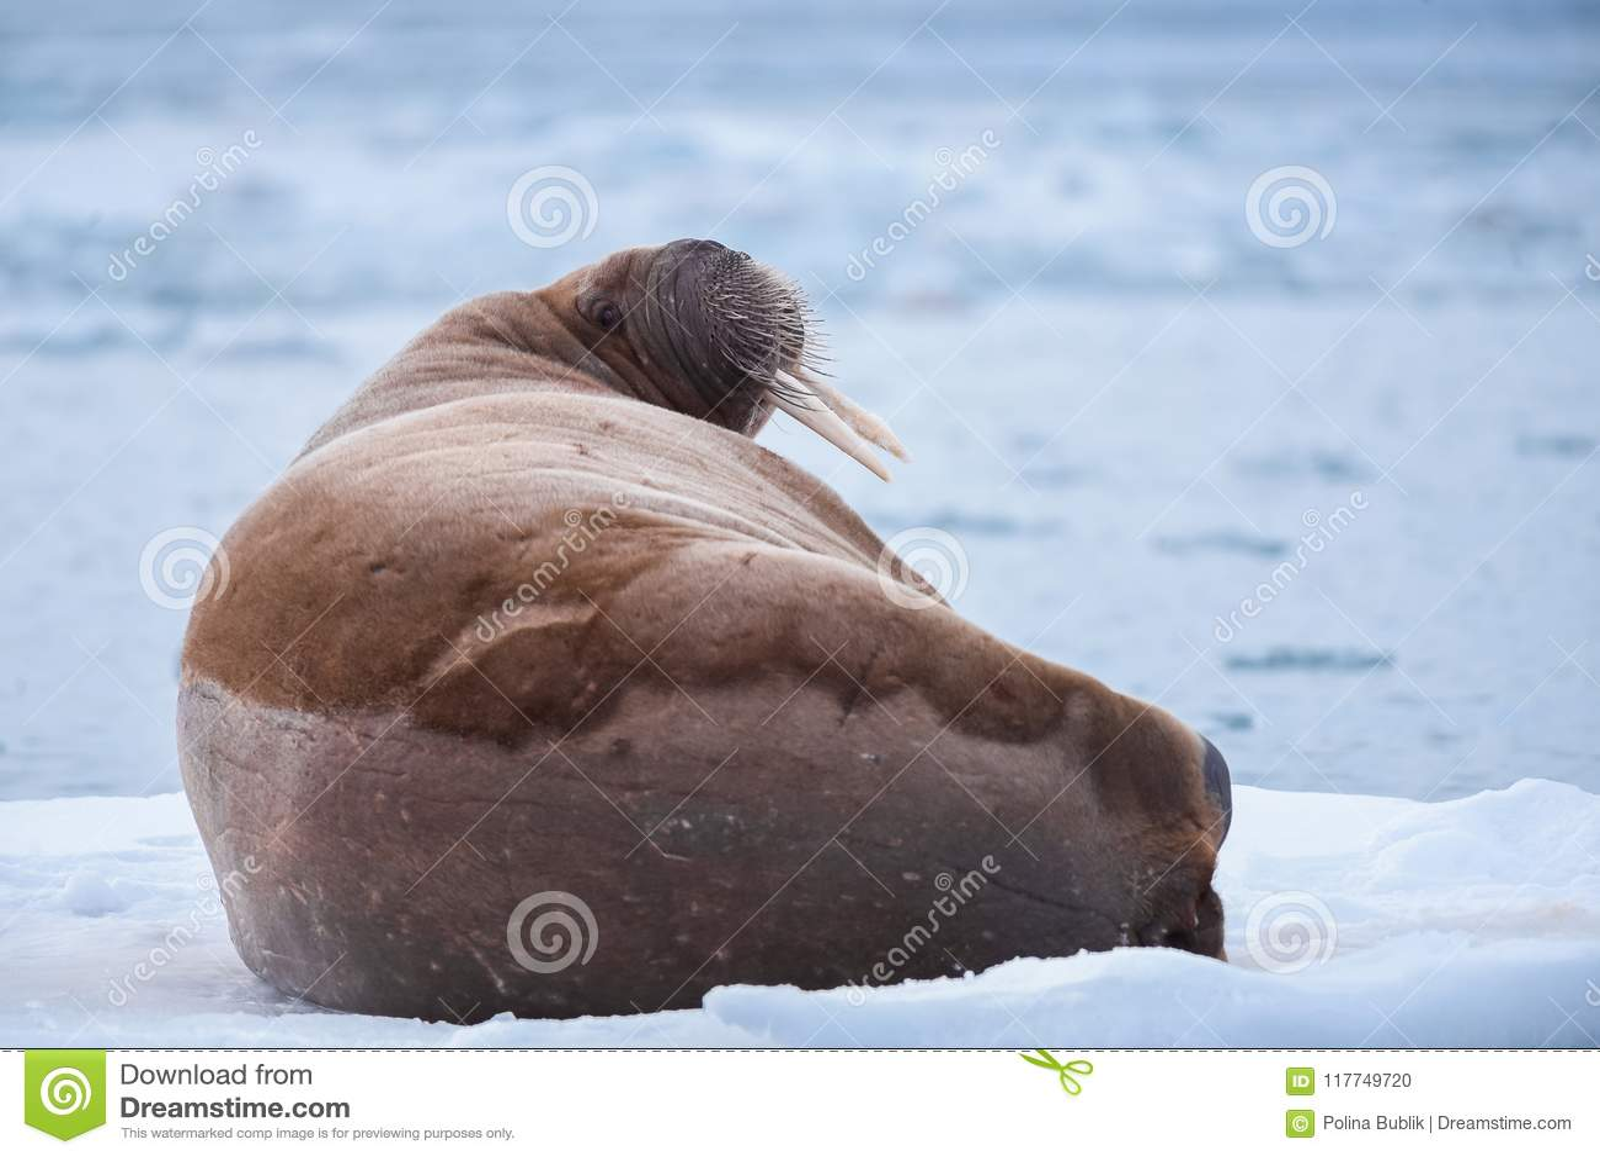 Landscape nature walrus on an ice floe of Spitsbergen Longyearbyen Svalbard arctic winter sunshine day